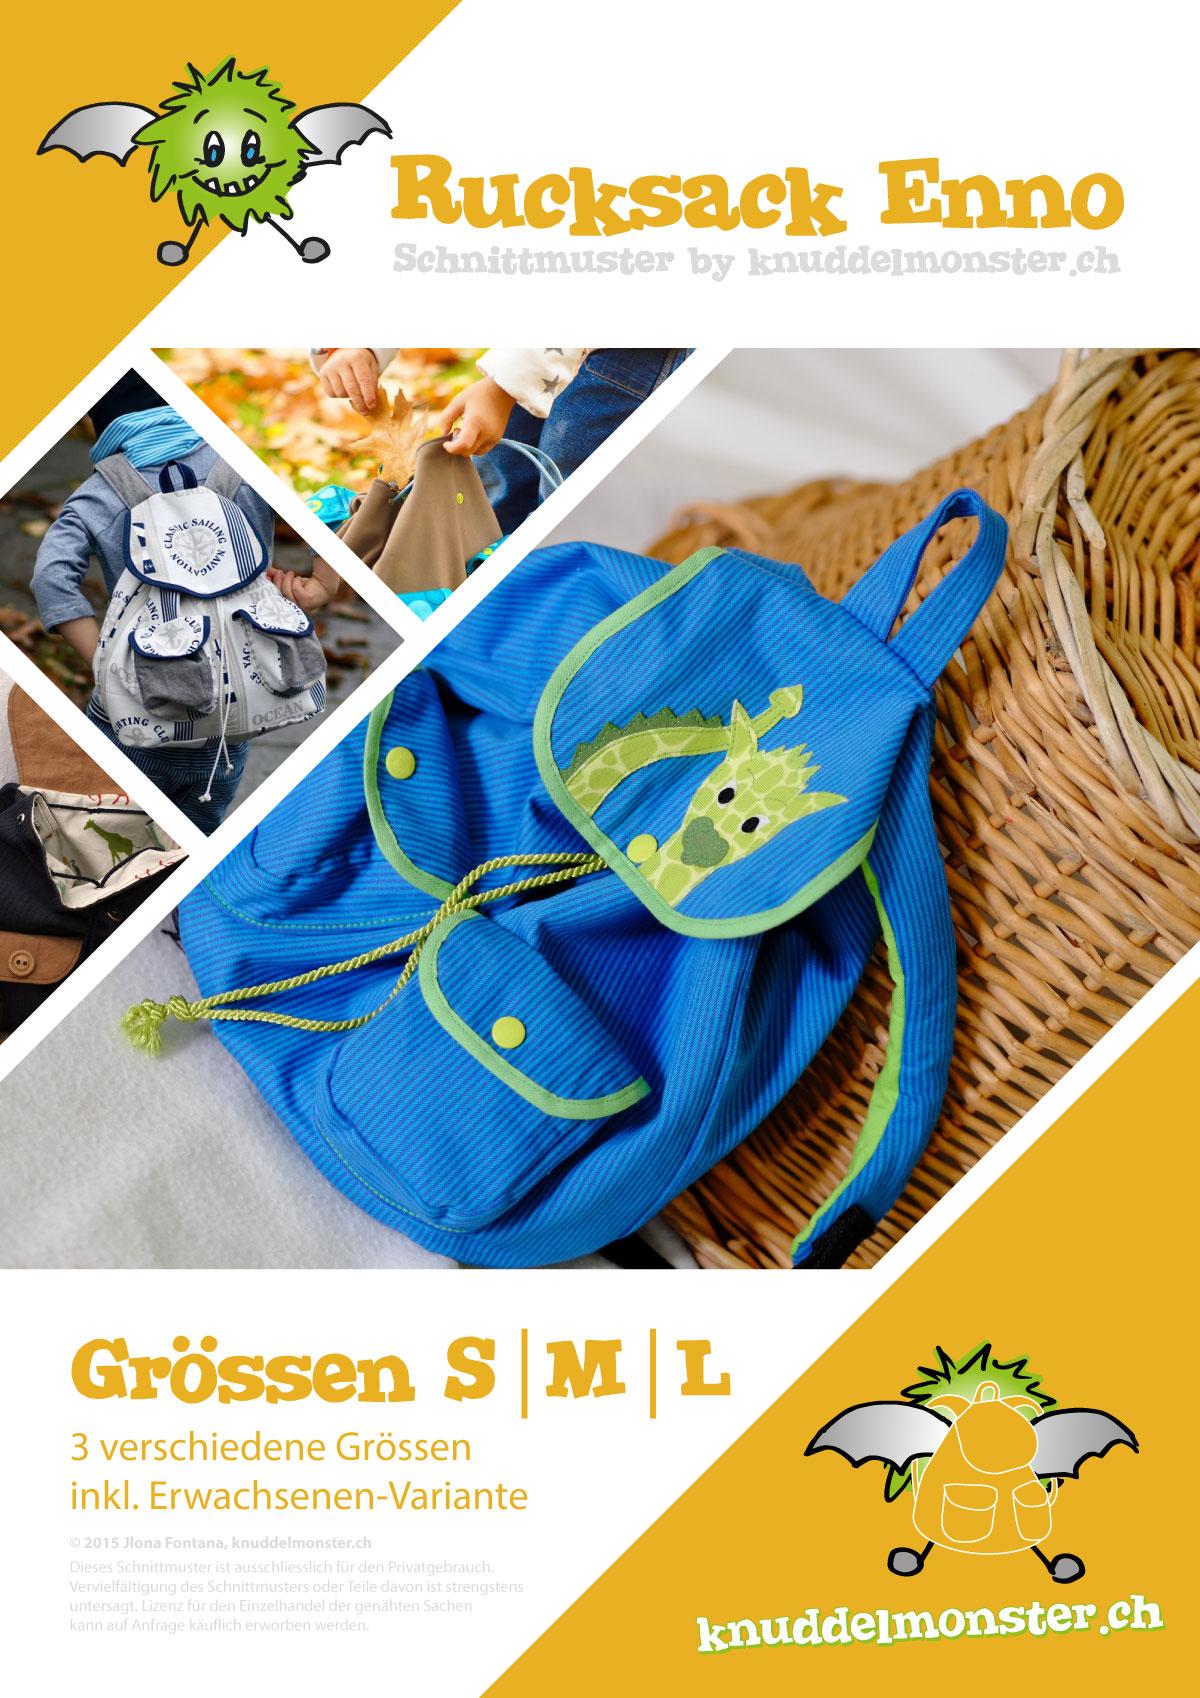 Schnittmuster – Rucksack Enno – Grössen: S, M, L | Knuddelmonster